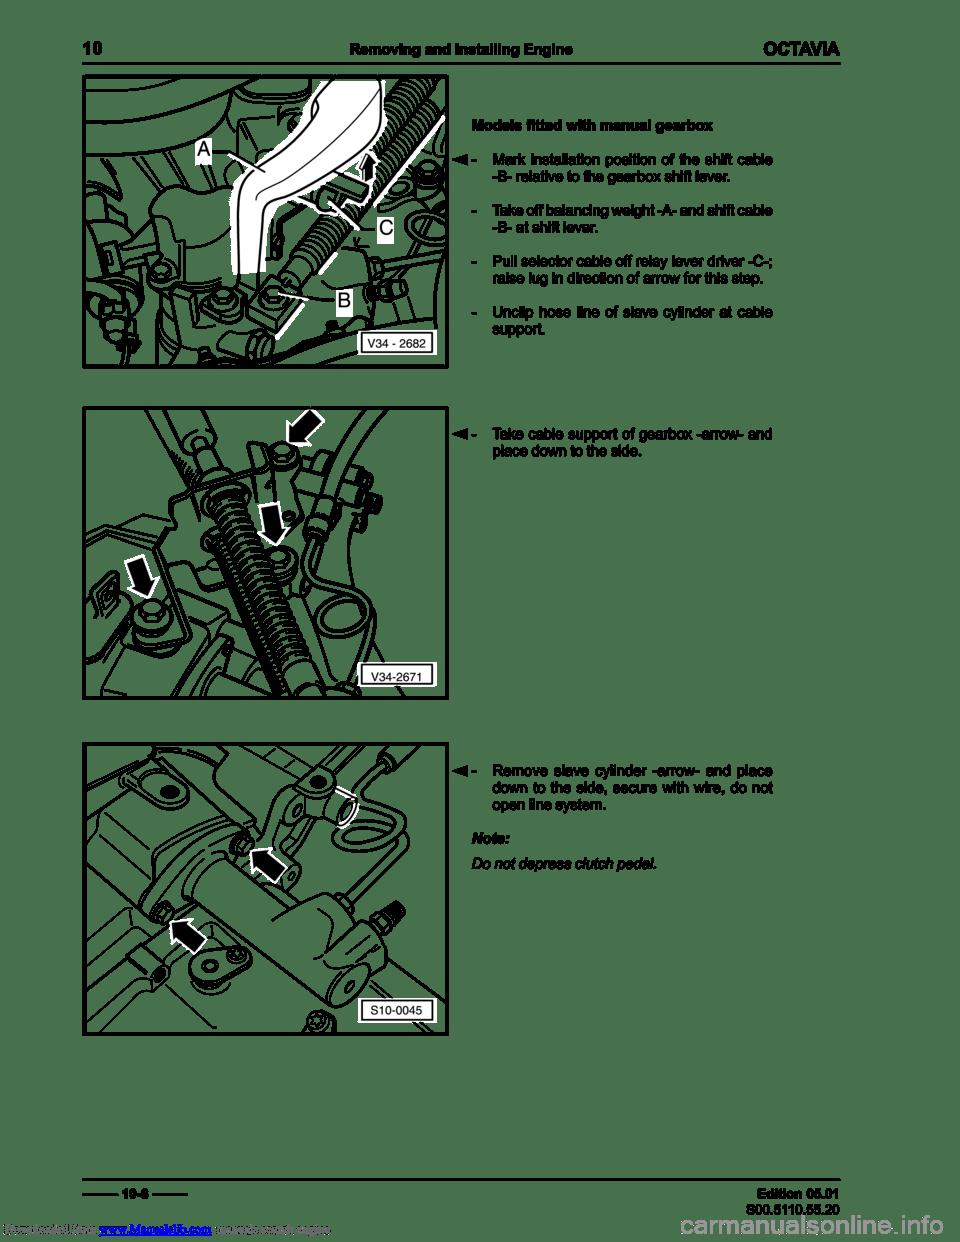 SKODA OCTAVIA 1999 1.G / (1U) 1.9TDi 66kw Engine Workshop